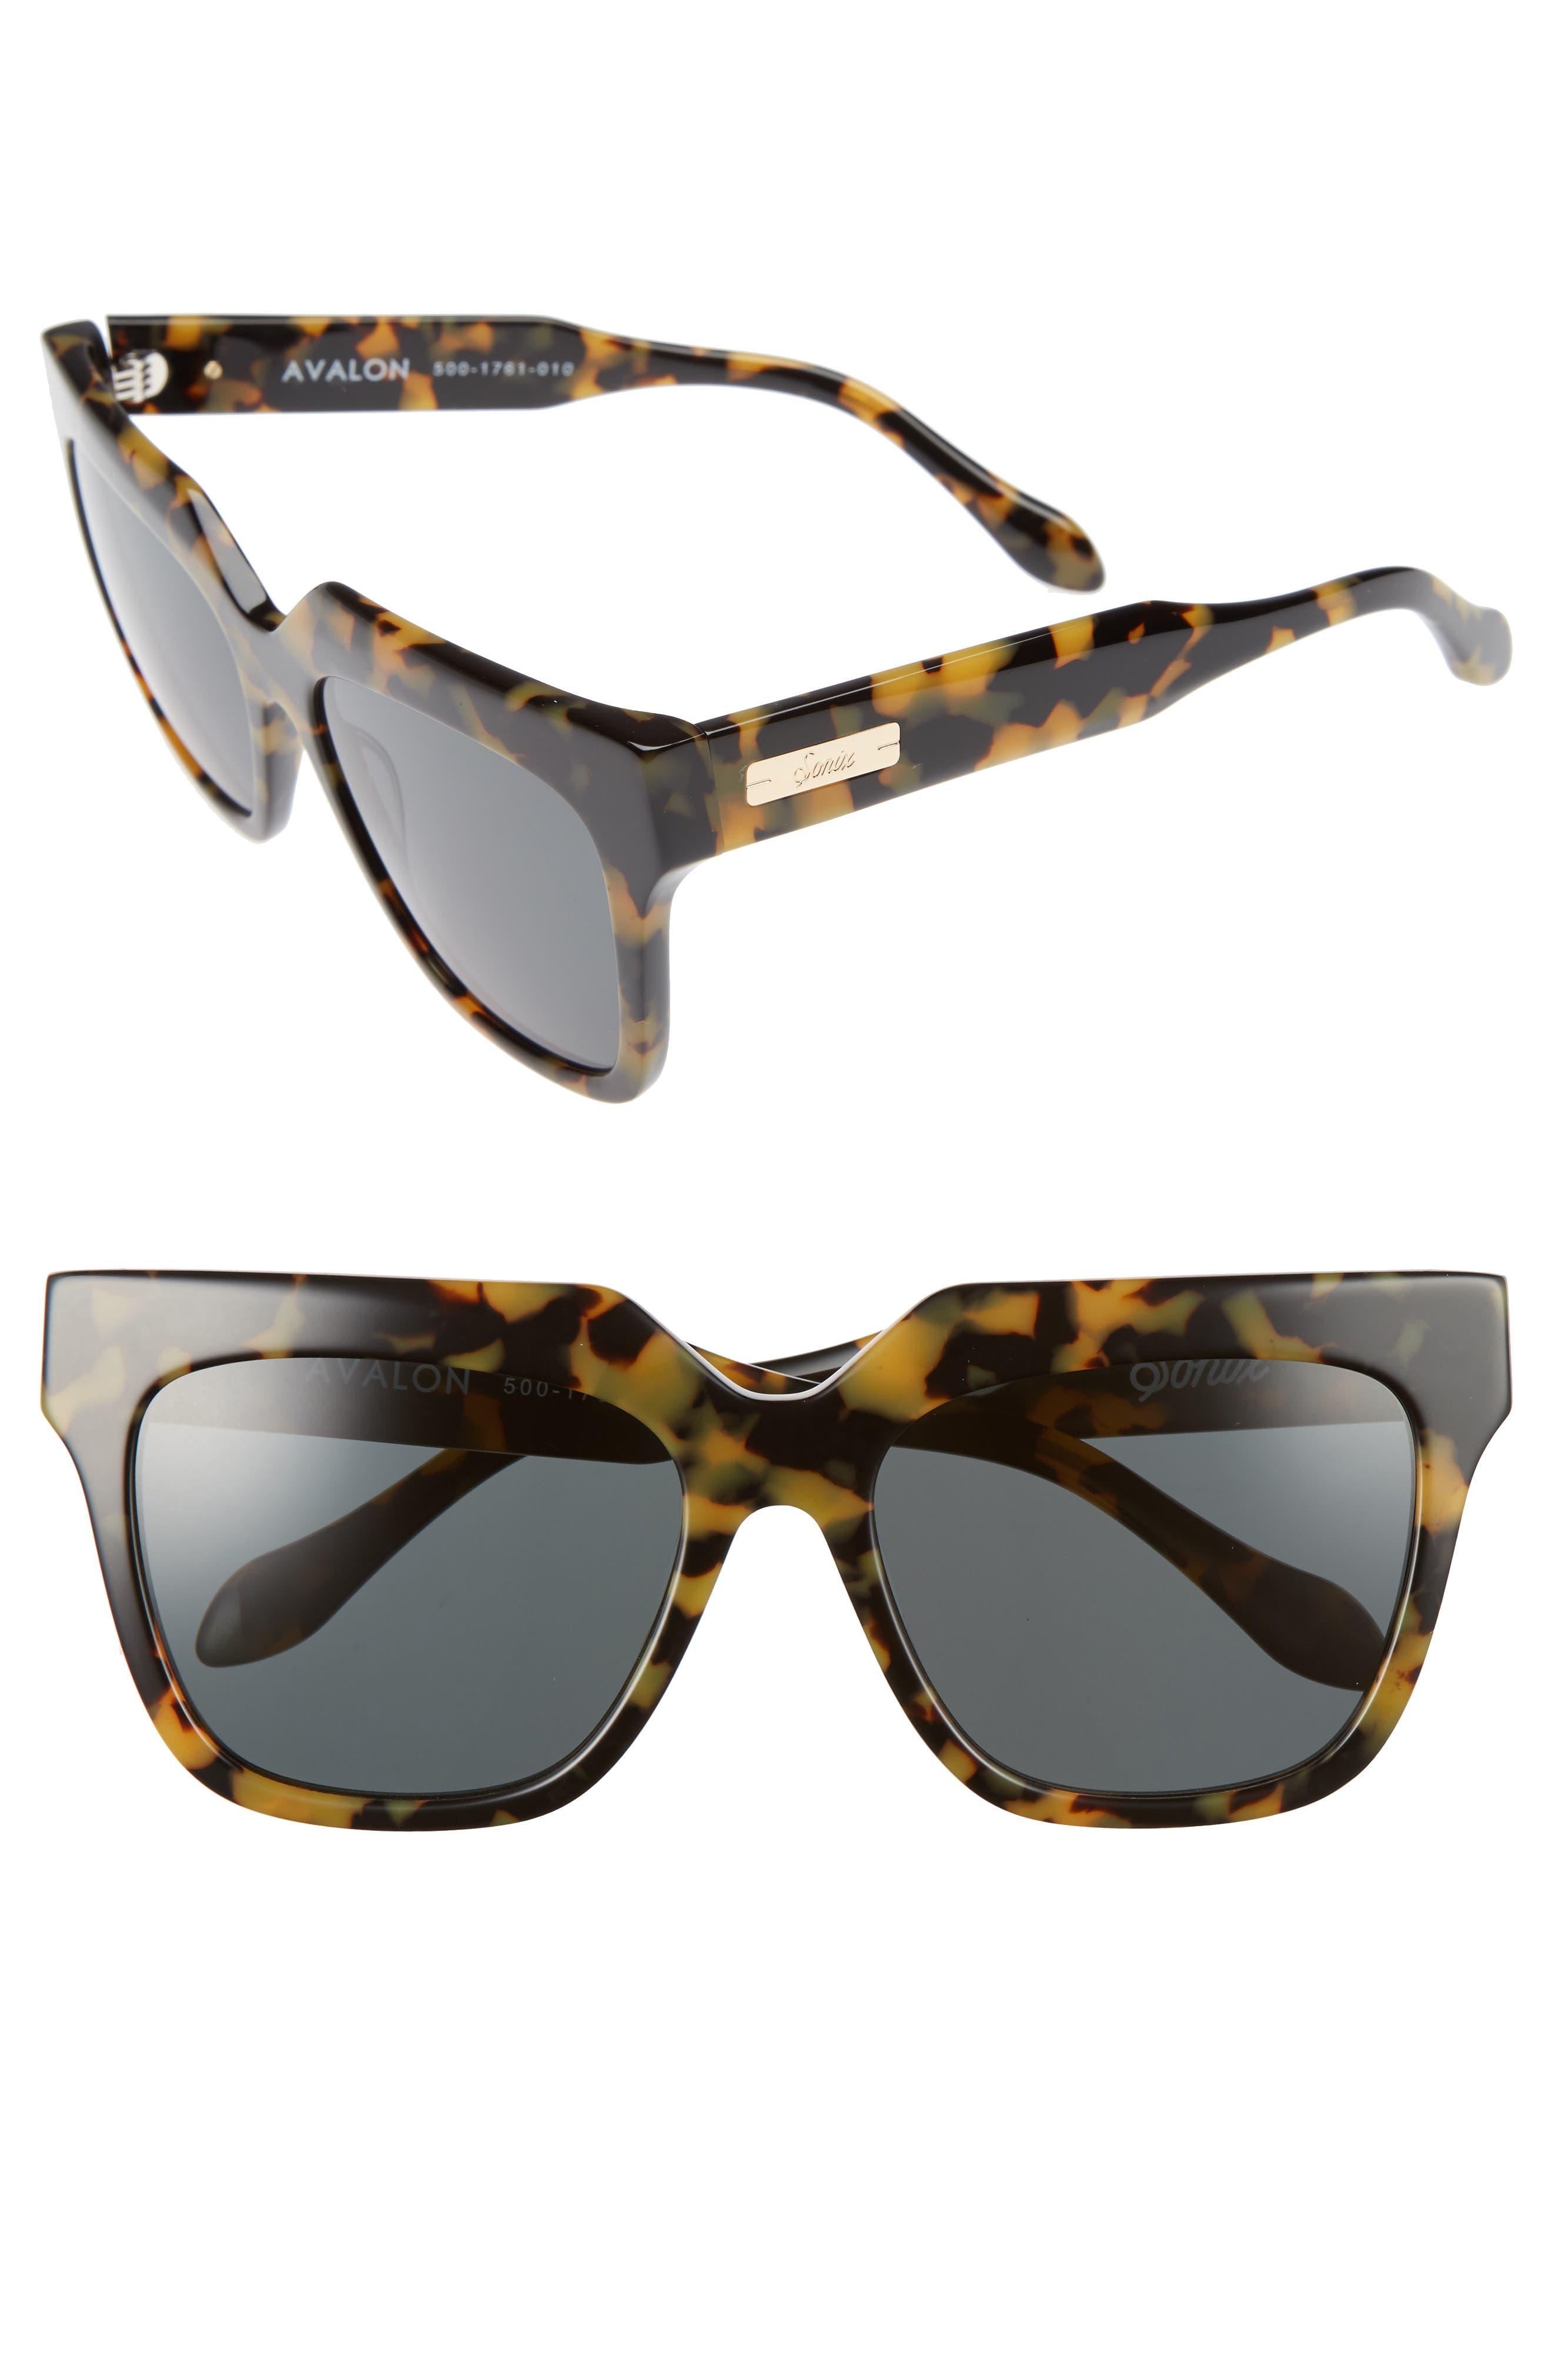 Alternate Image 1 Selected - Sonix Avalon 57mm Retro Sunglasses